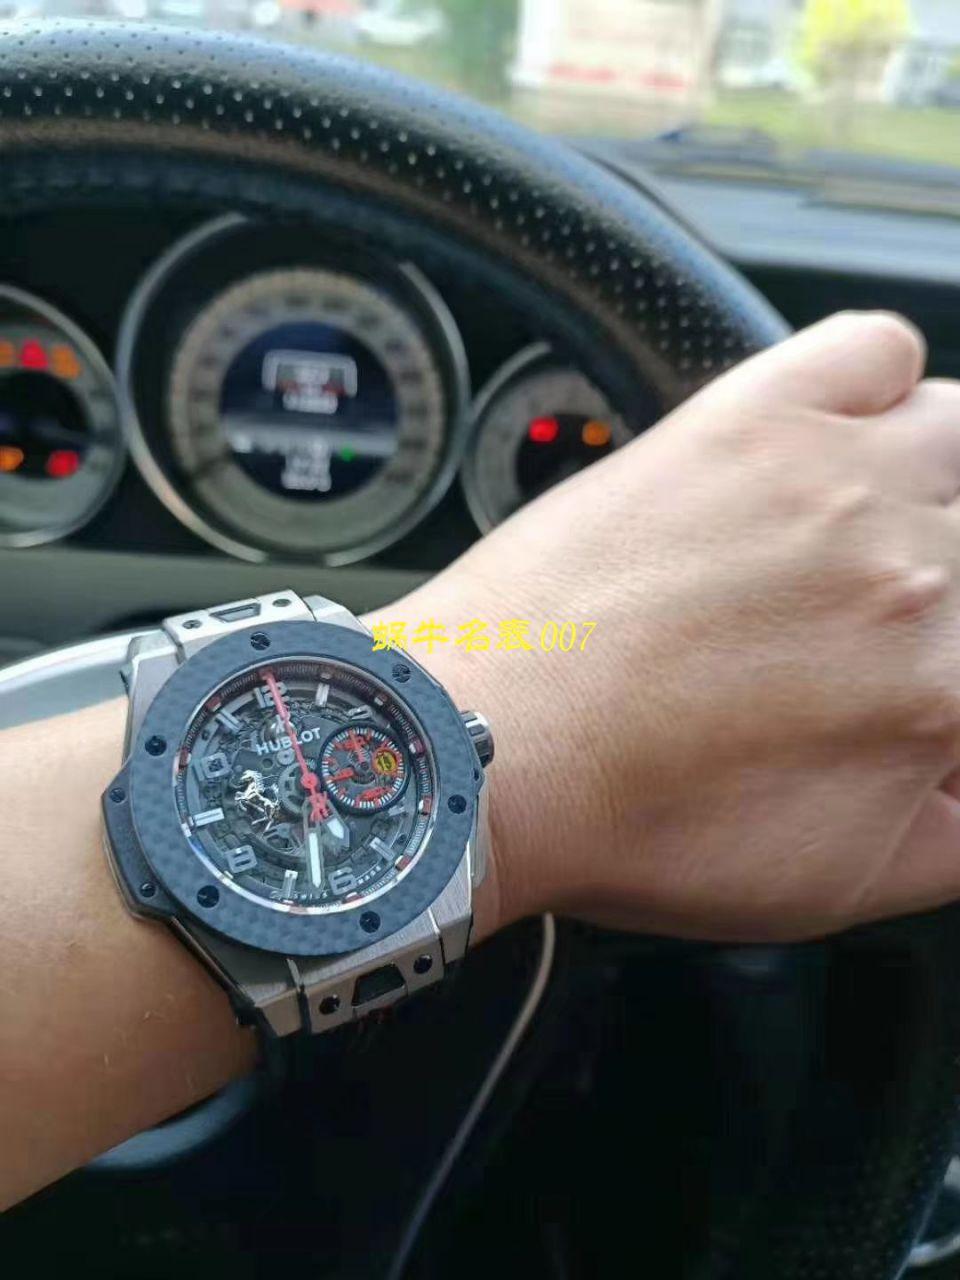 【视频评测V6出品】Hublot Big Bang Ferrari Titanium F3系列 宇舶法拉利401.NQ.0123.VR腕表